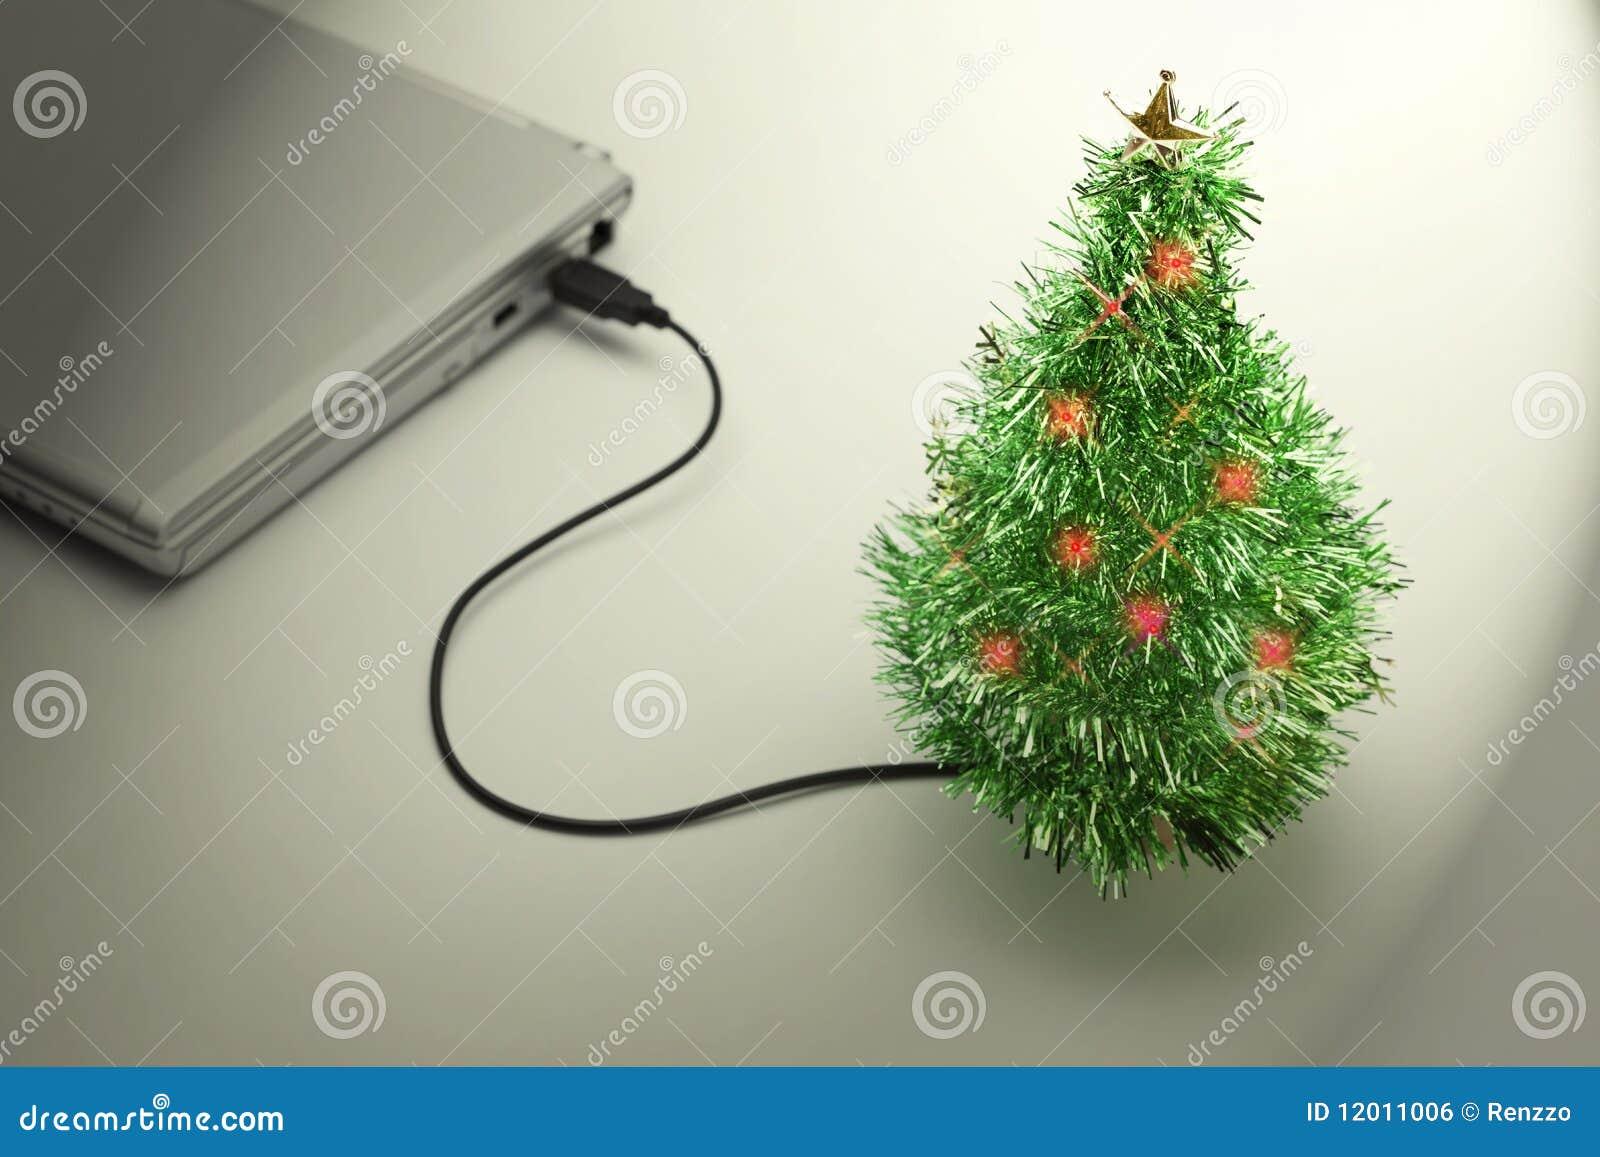 download christmas vacation usb christmas tree stock photo image of rest getaway - Christmas Vacation Tree